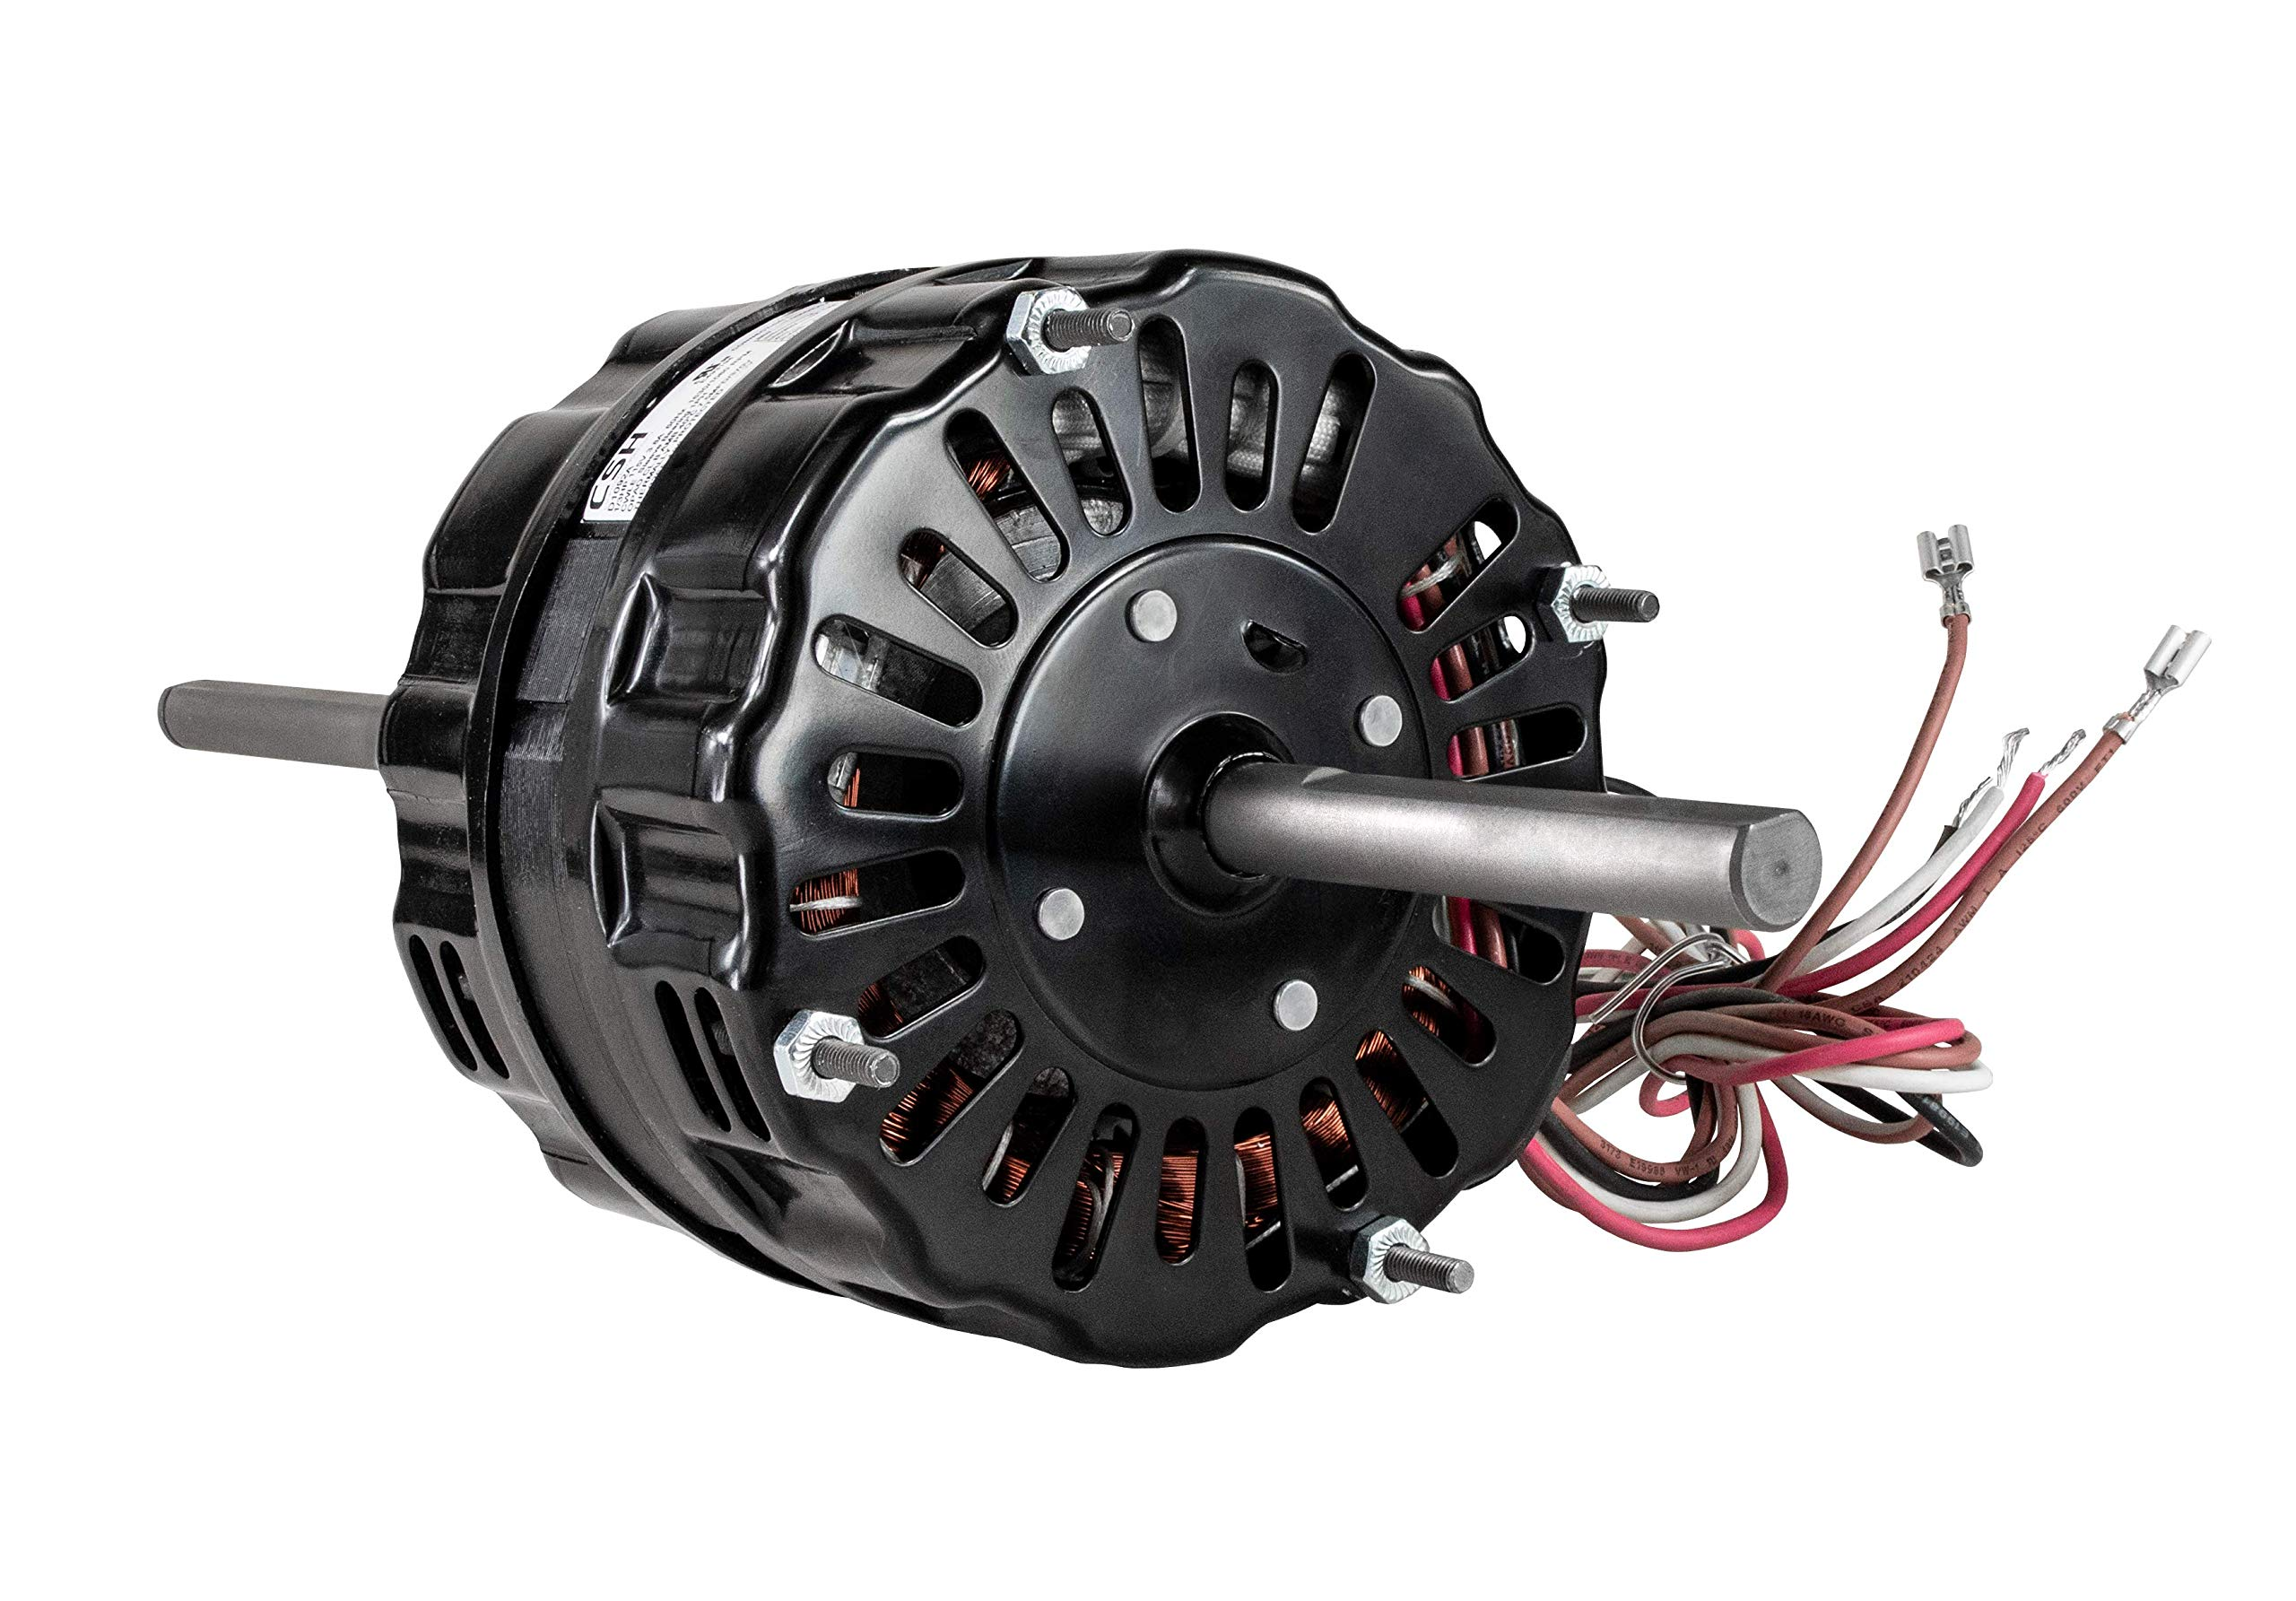 1/3 HP 115 Volt 1625 RPM 2-Speed Coleman RV Air Conditioner Motor Replaces Fasco D1092